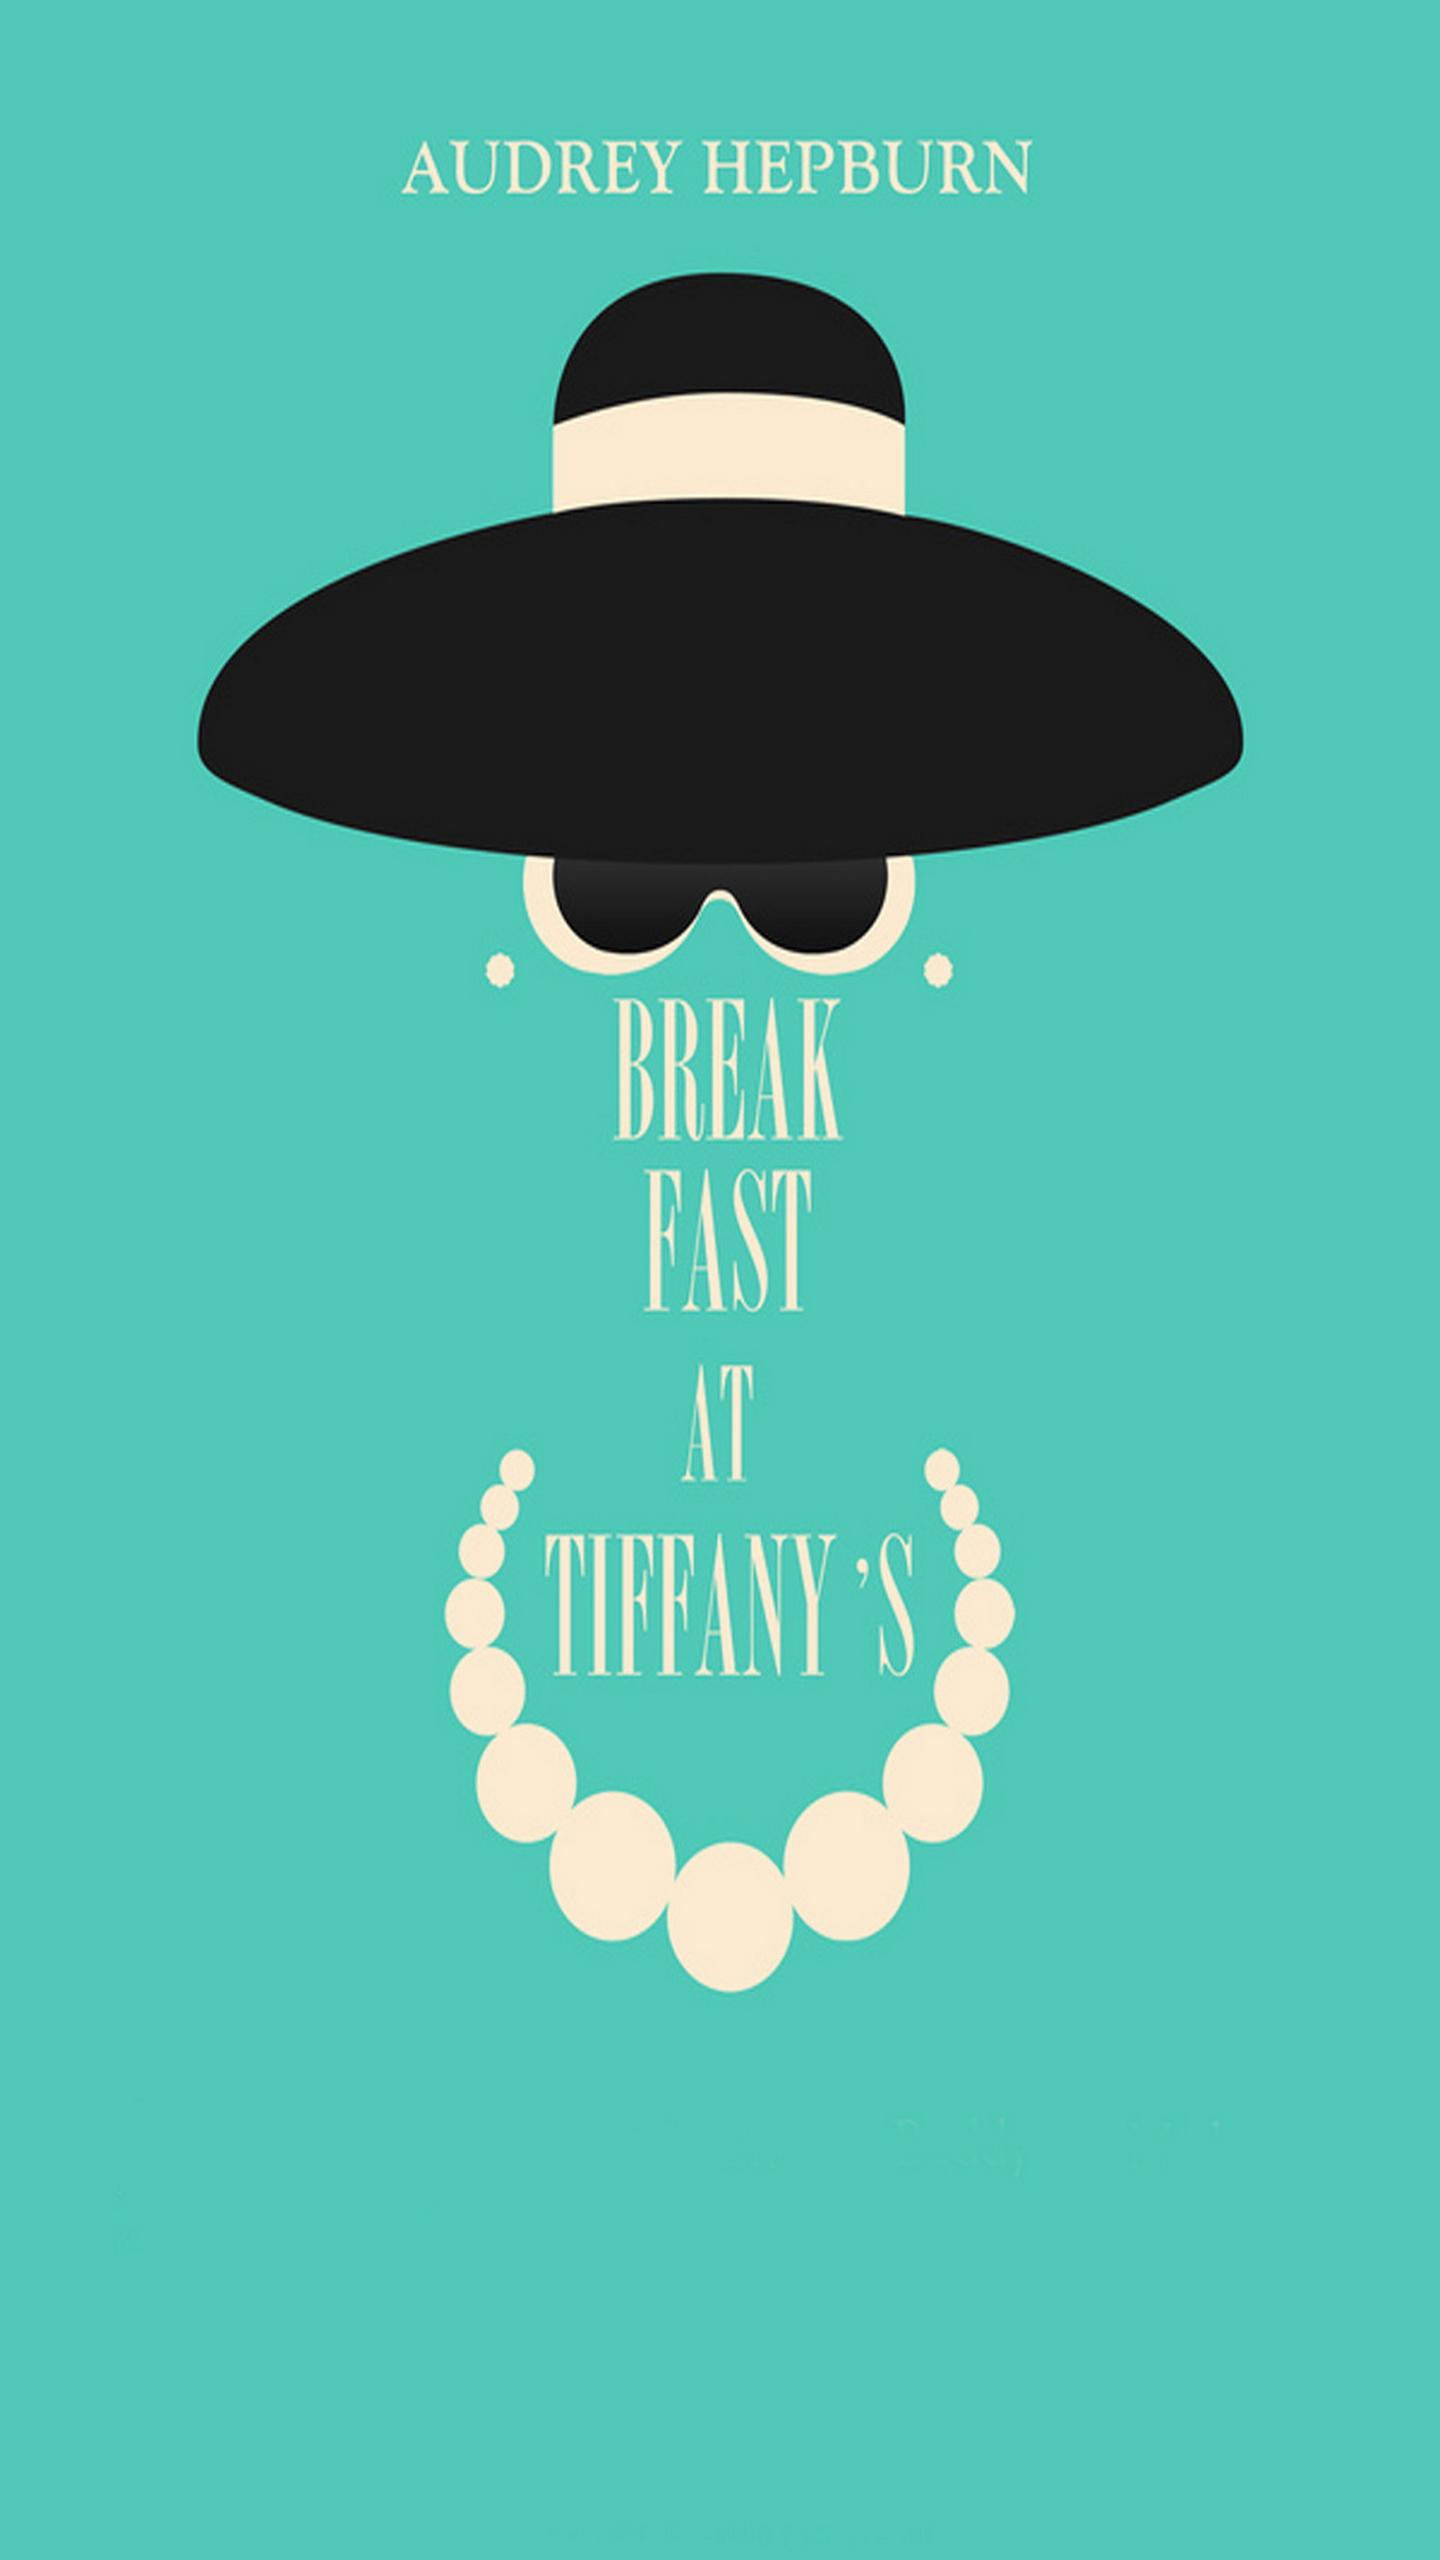 Breakfast At Tiffany S Wallpaper Wallpapersafari HD Wallpapers Download Free Images Wallpaper [1000image.com]